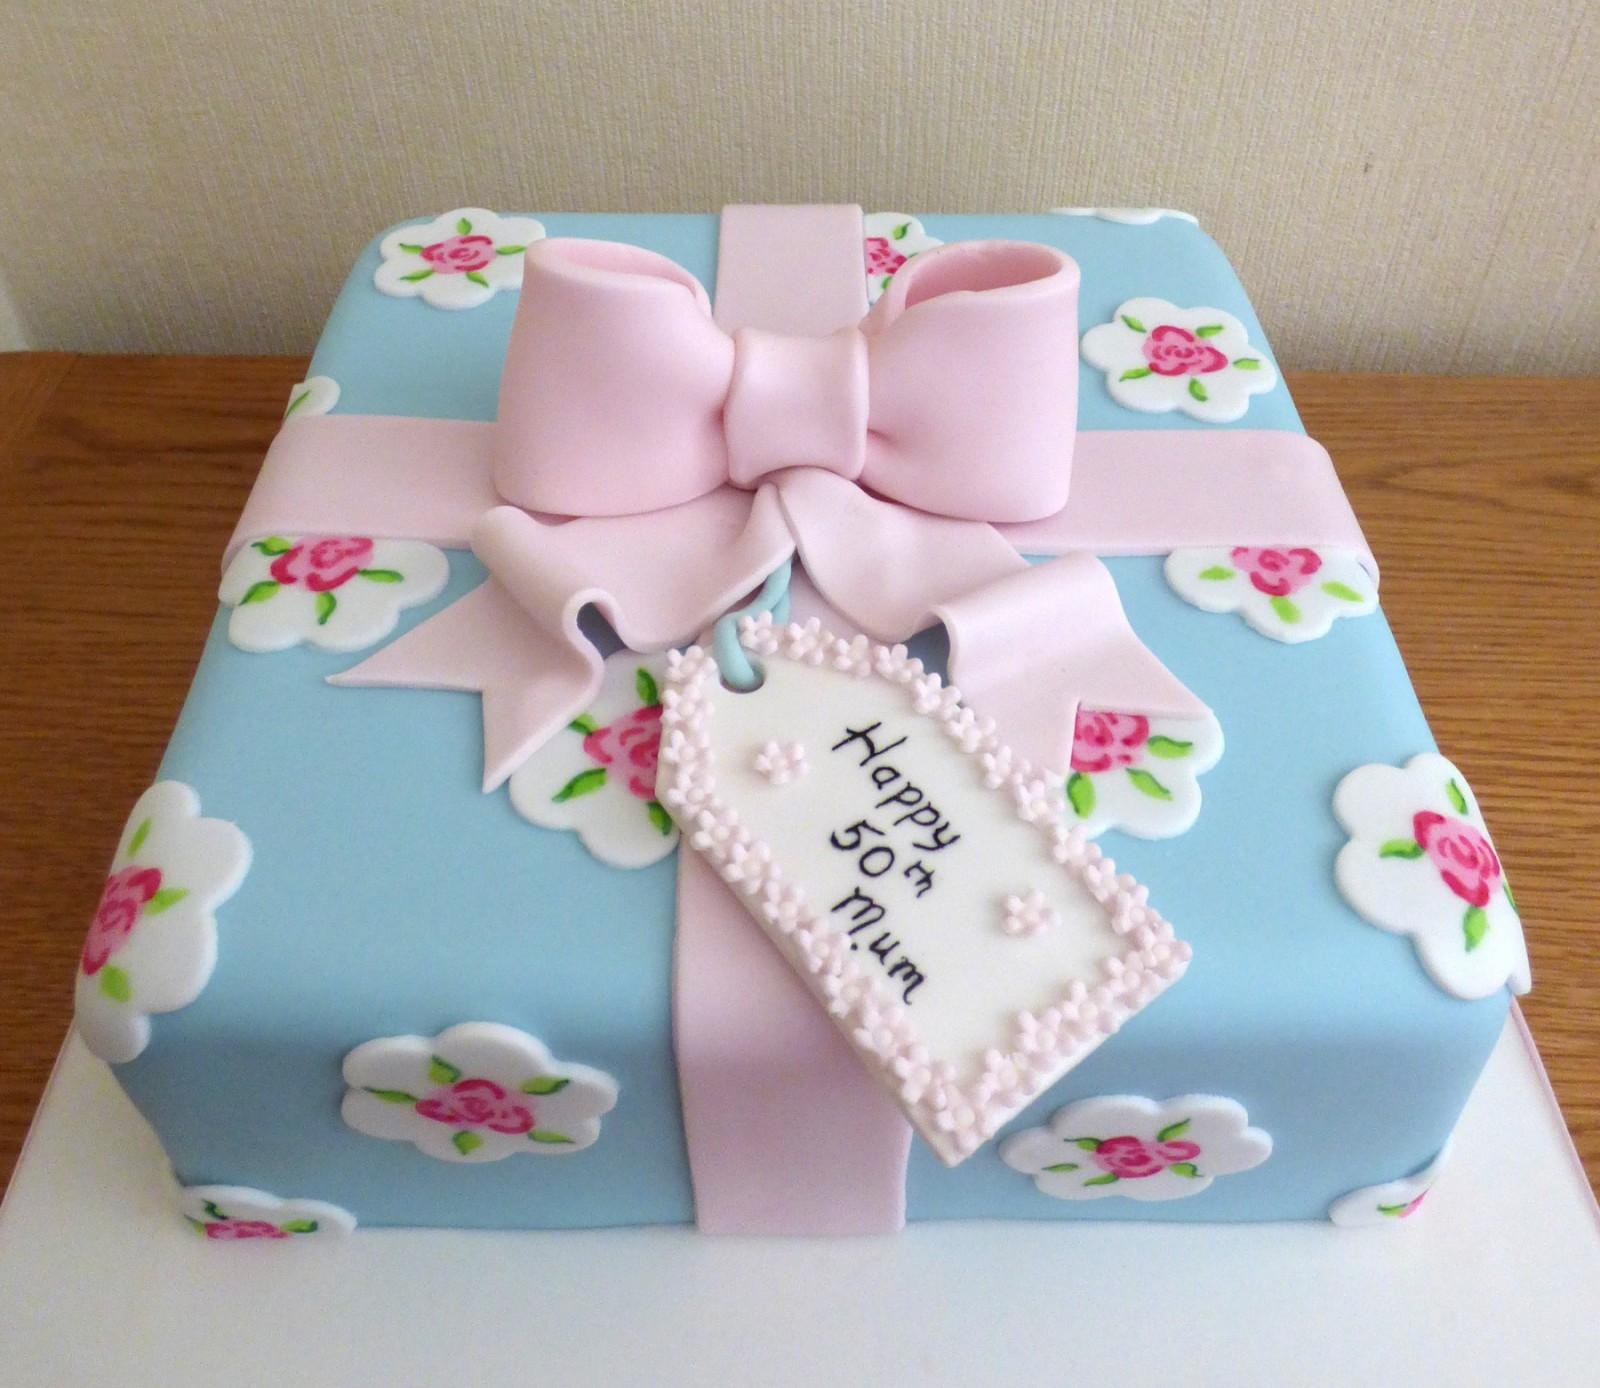 Admirable Cath Kidston Style Birthday Present Cake Susies Cakes Funny Birthday Cards Online Drosicarndamsfinfo